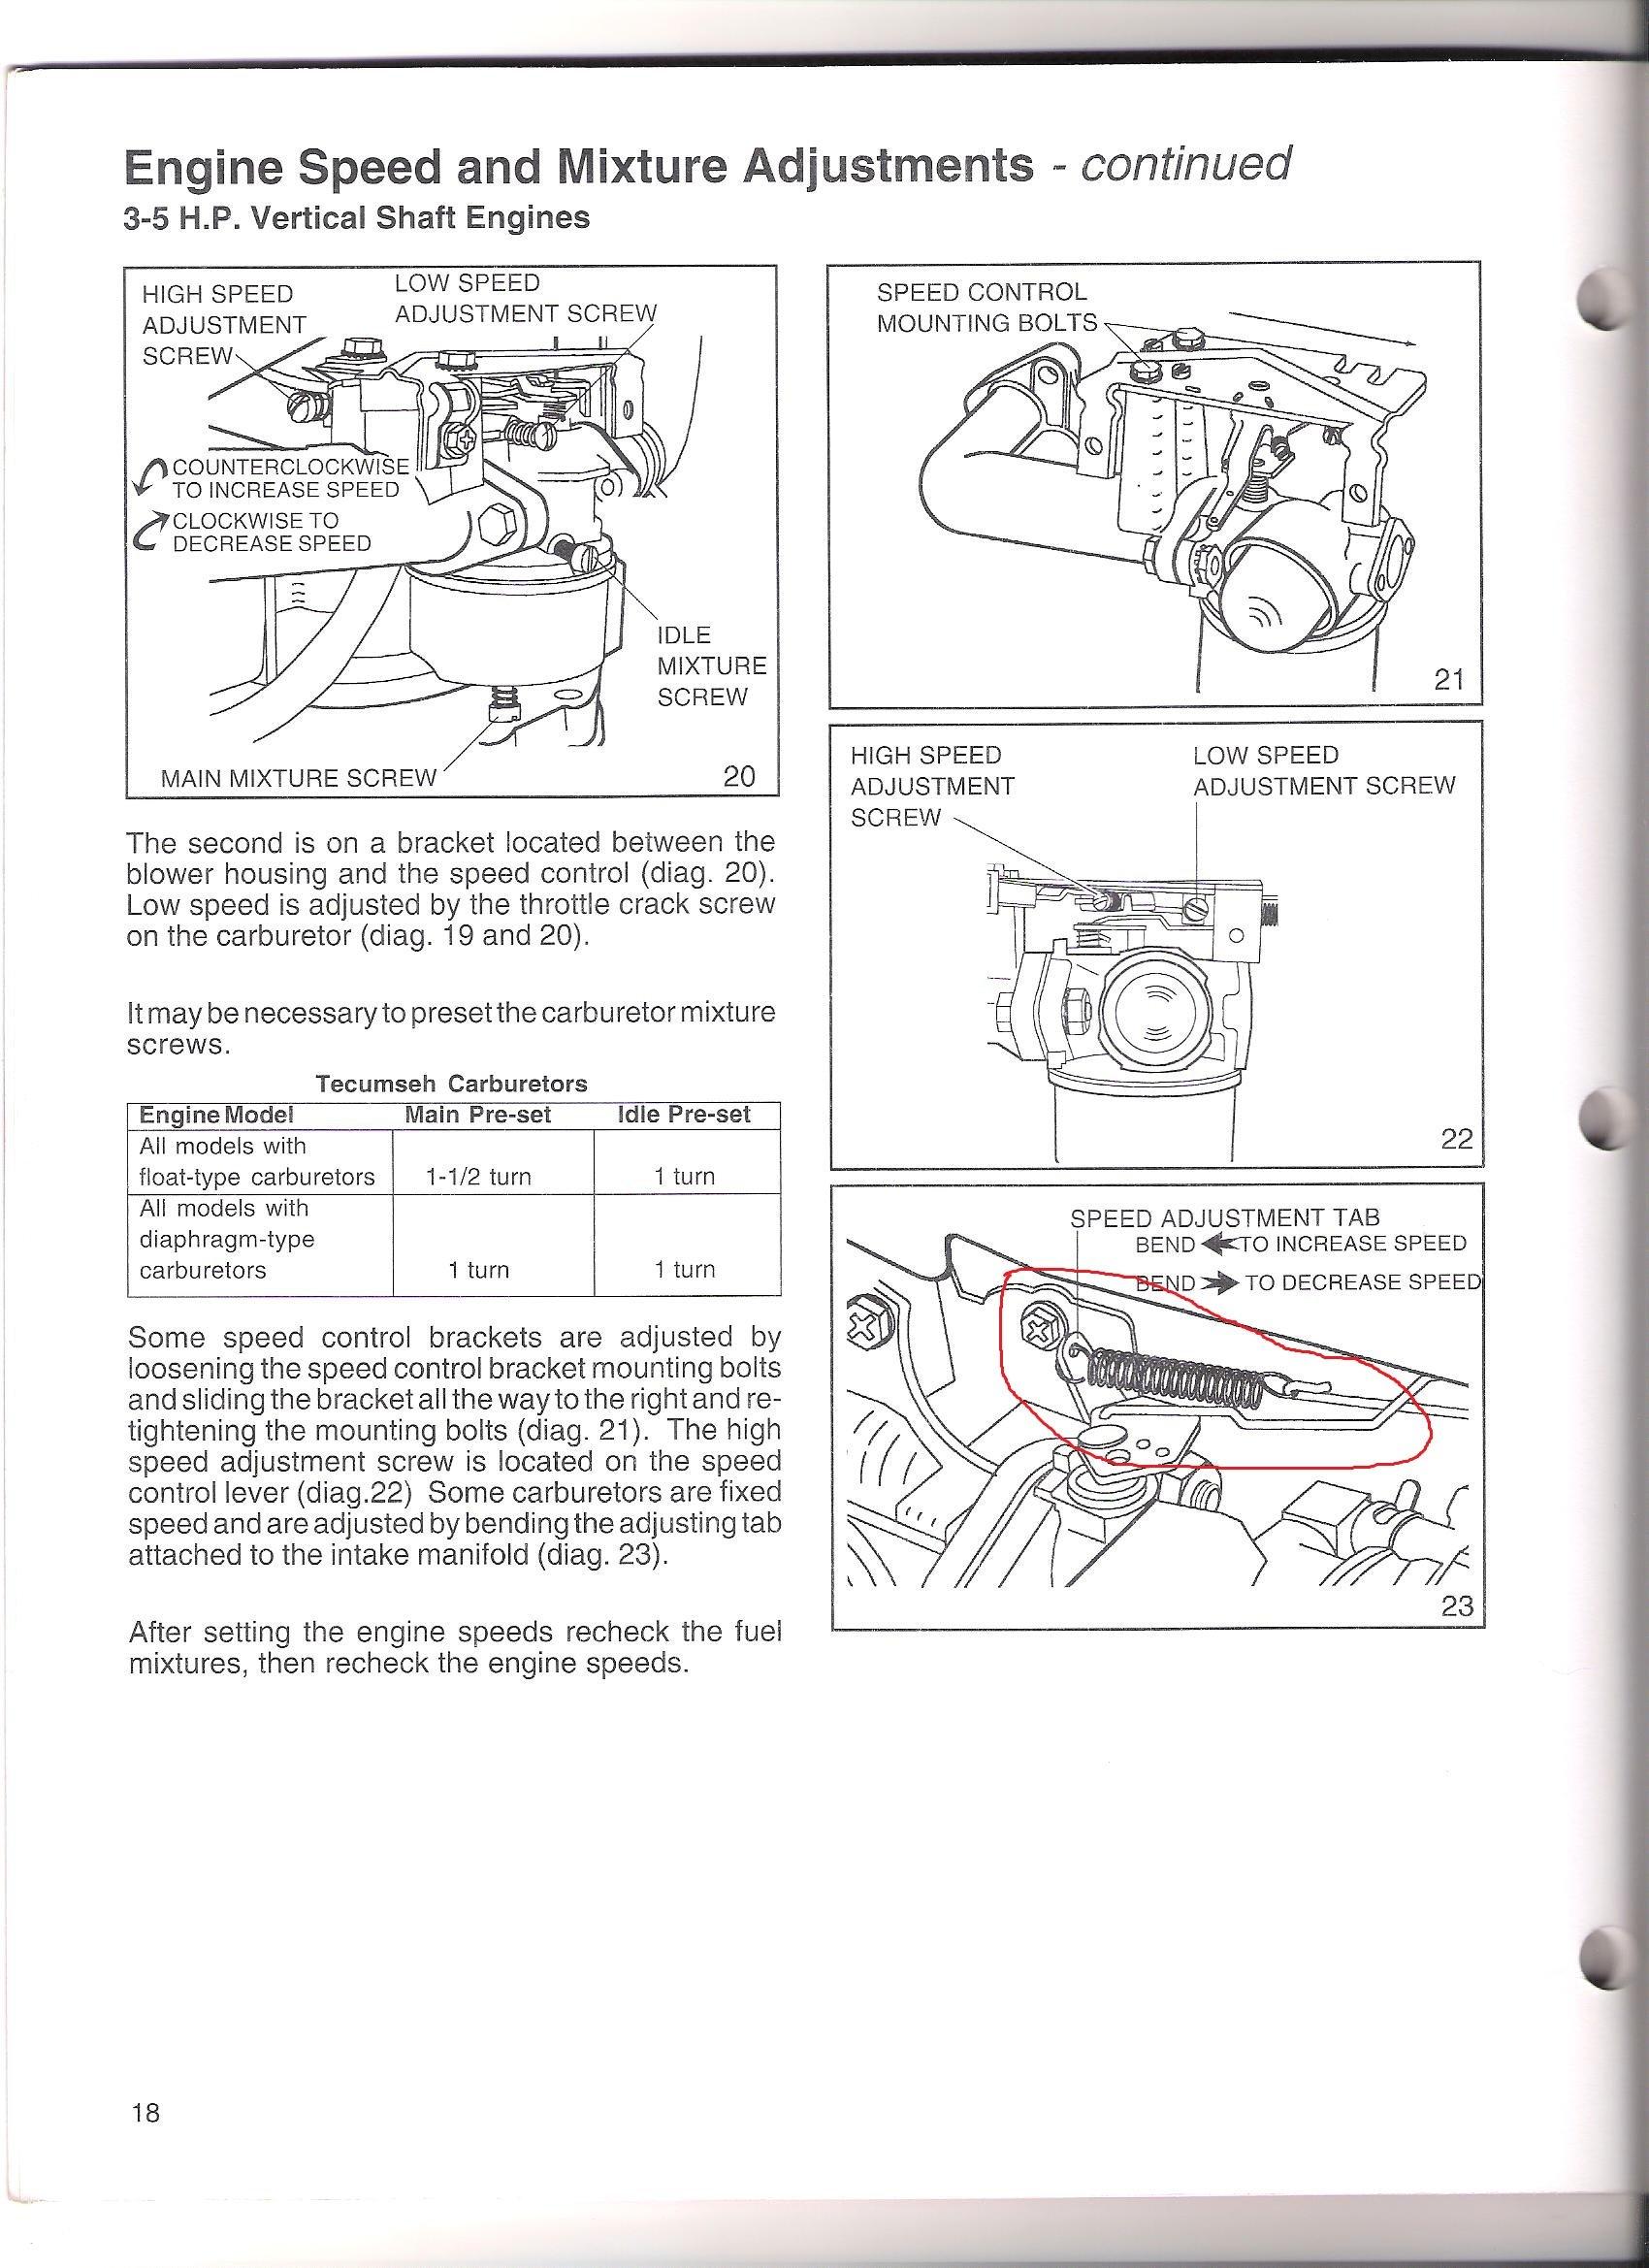 I have a Toro mower mod.#20016 sgl speed 6.0HP. I just rebuilt